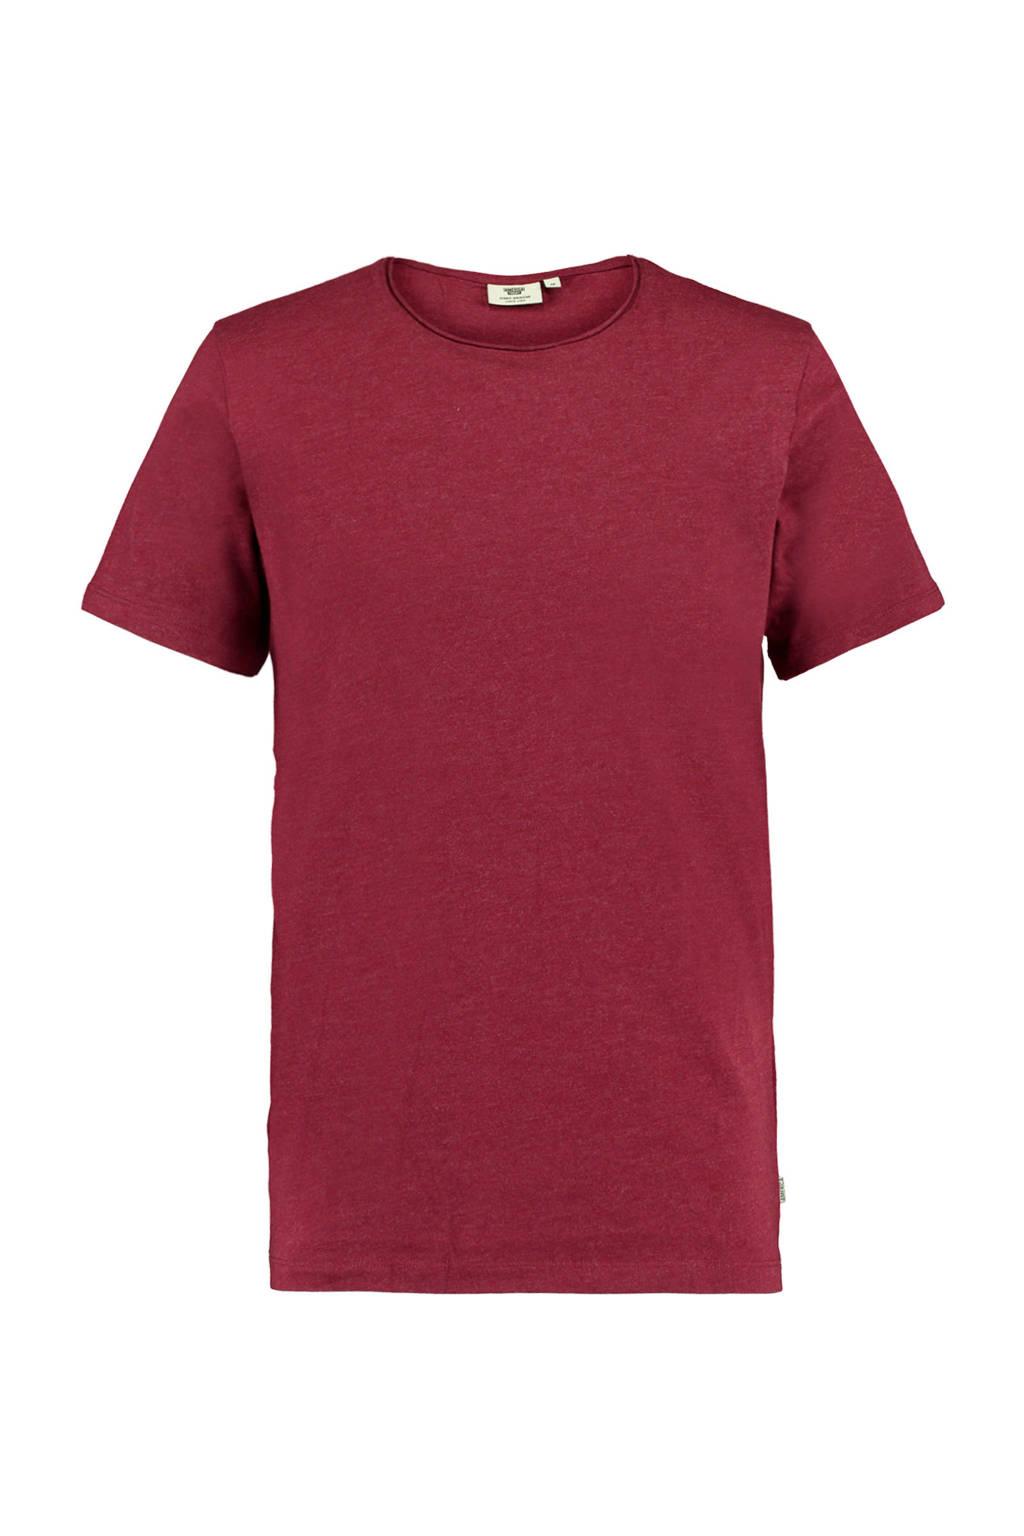 America Today gemêleerd T-shirt donkerrood, Donkerrood